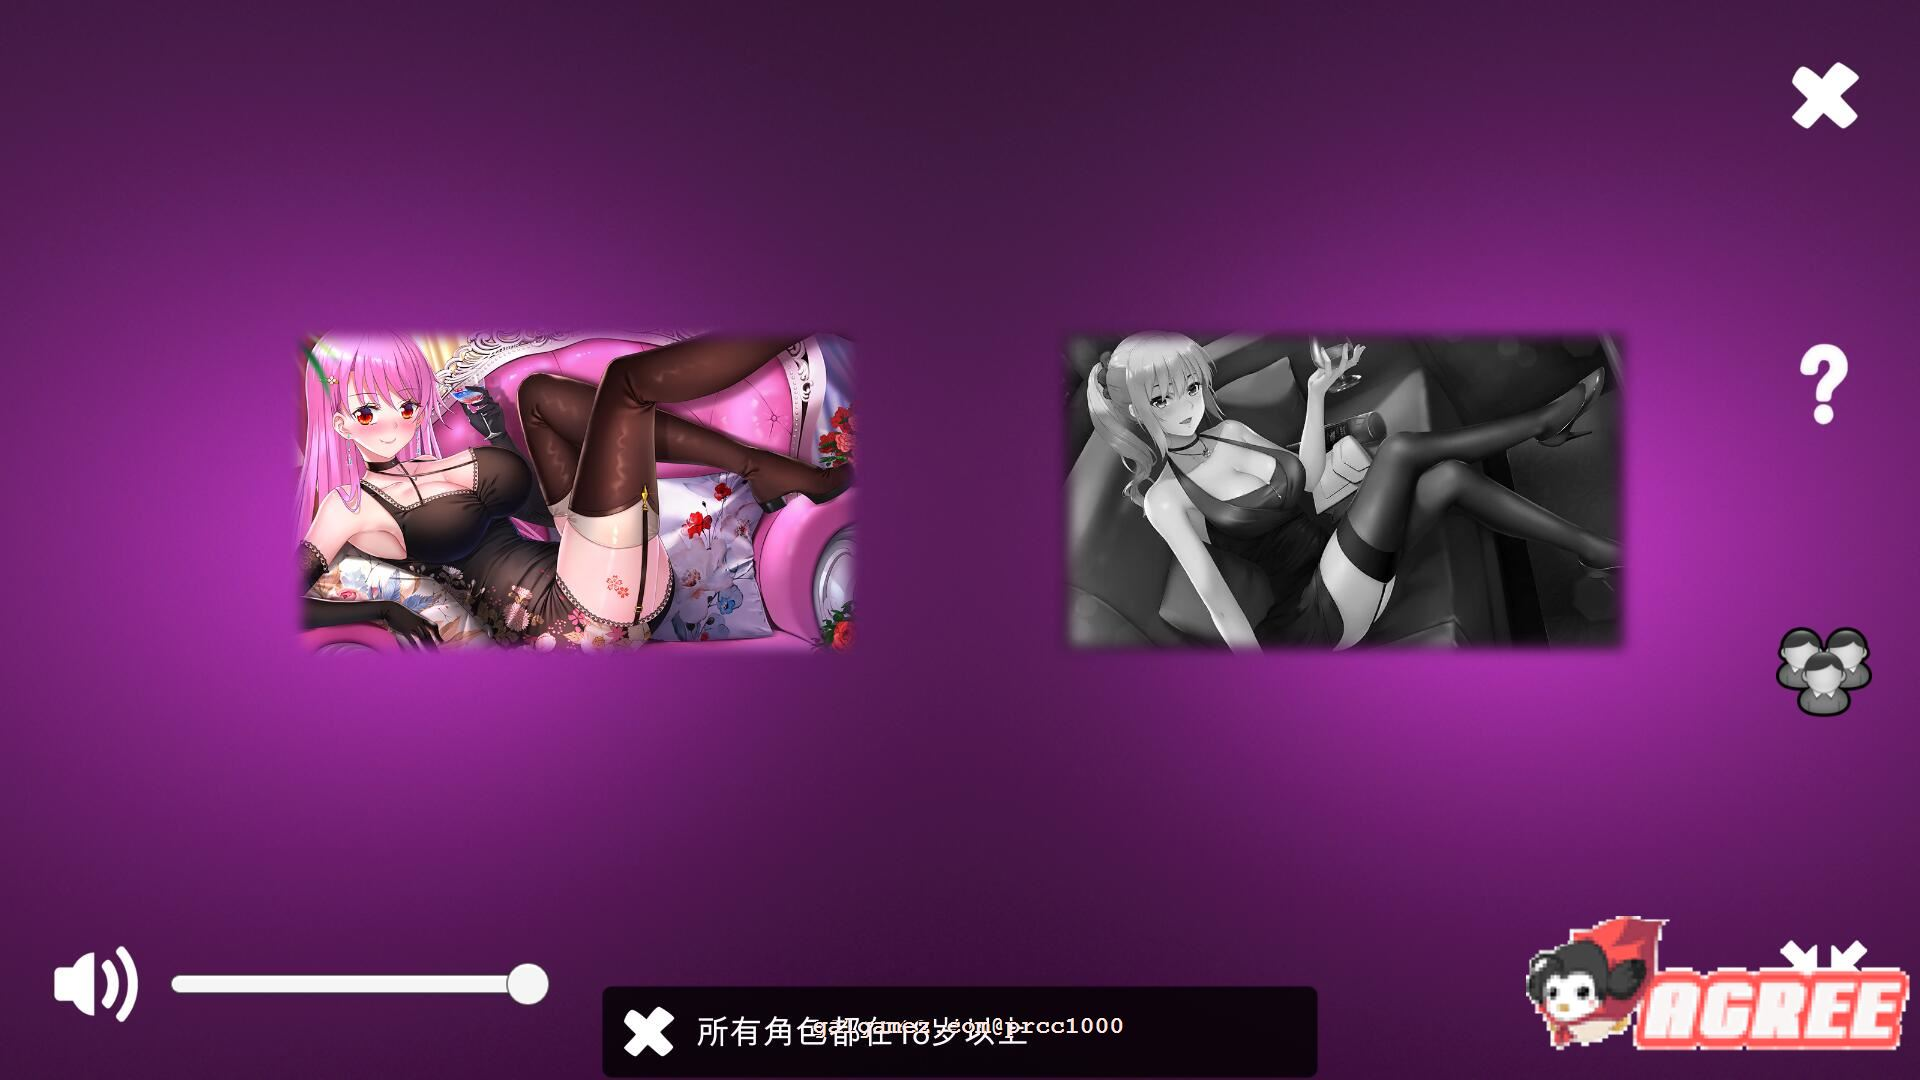 【SLG/中文/全动态】摇曳女孩之土味情话模拟器 V2.0官方中文步兵版【300M/更新/全CV】